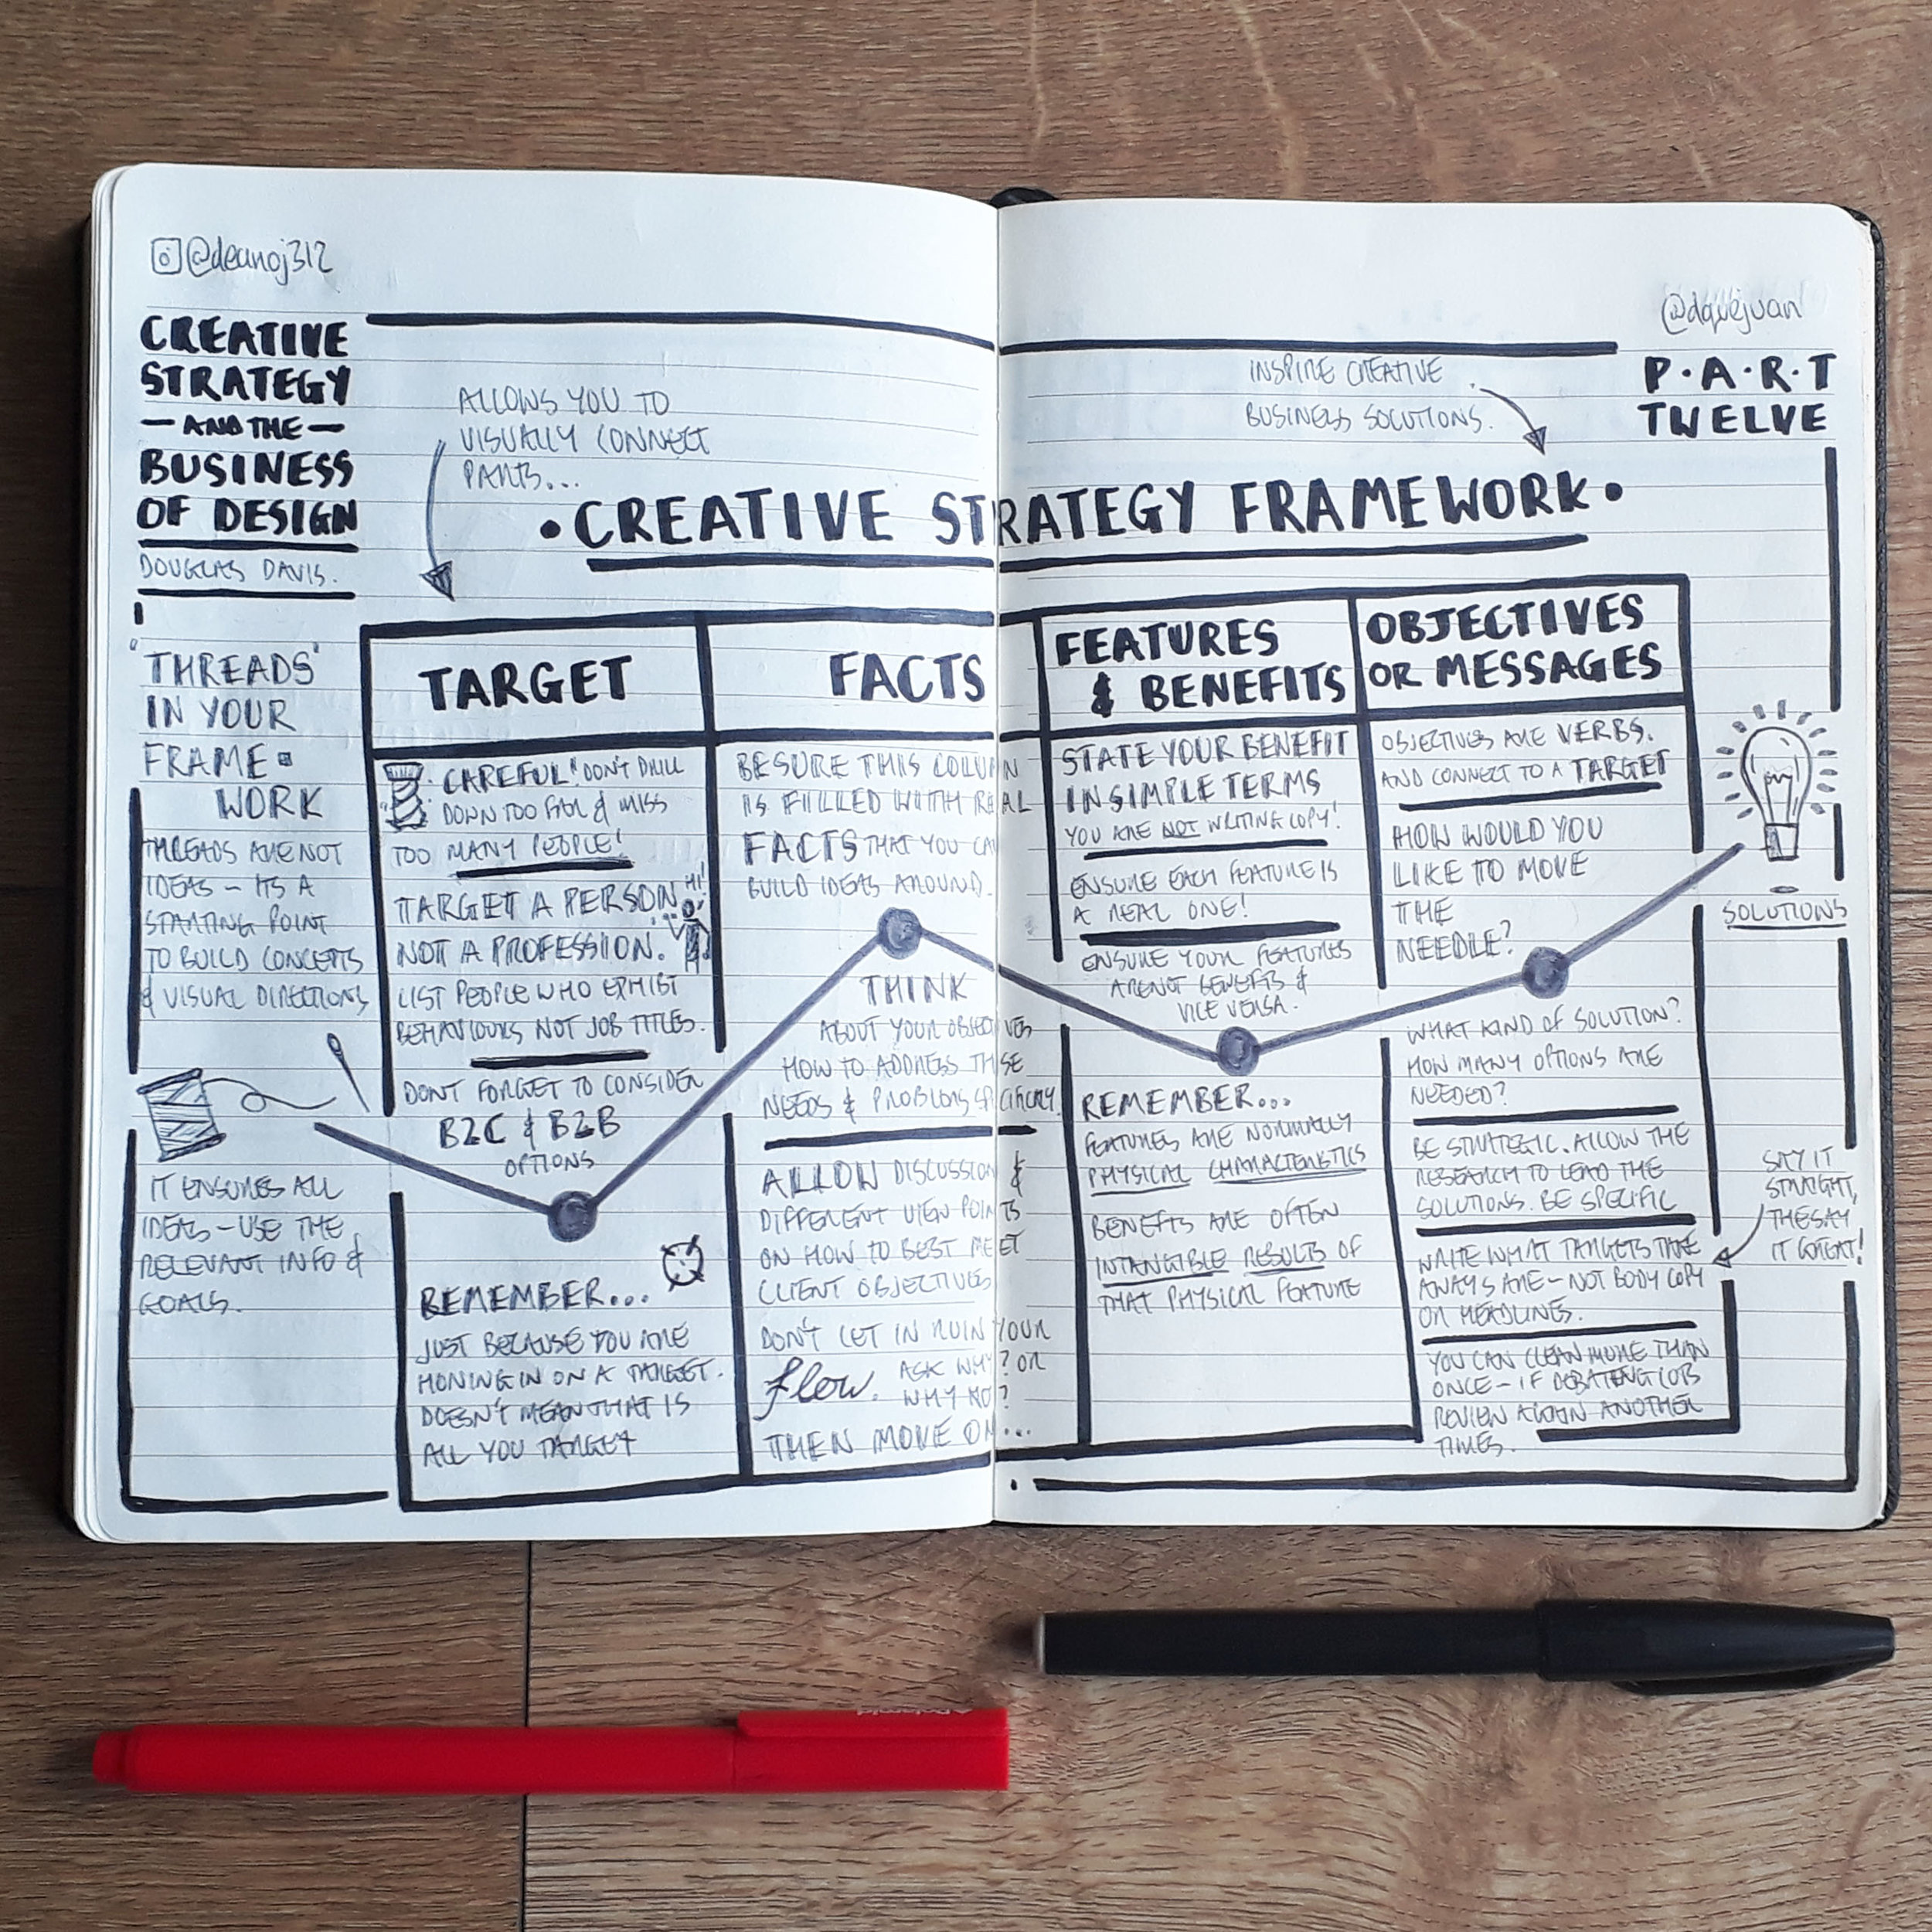 CreativeStrategyAndTheBusinessOfDesign_Part12.1.jpg